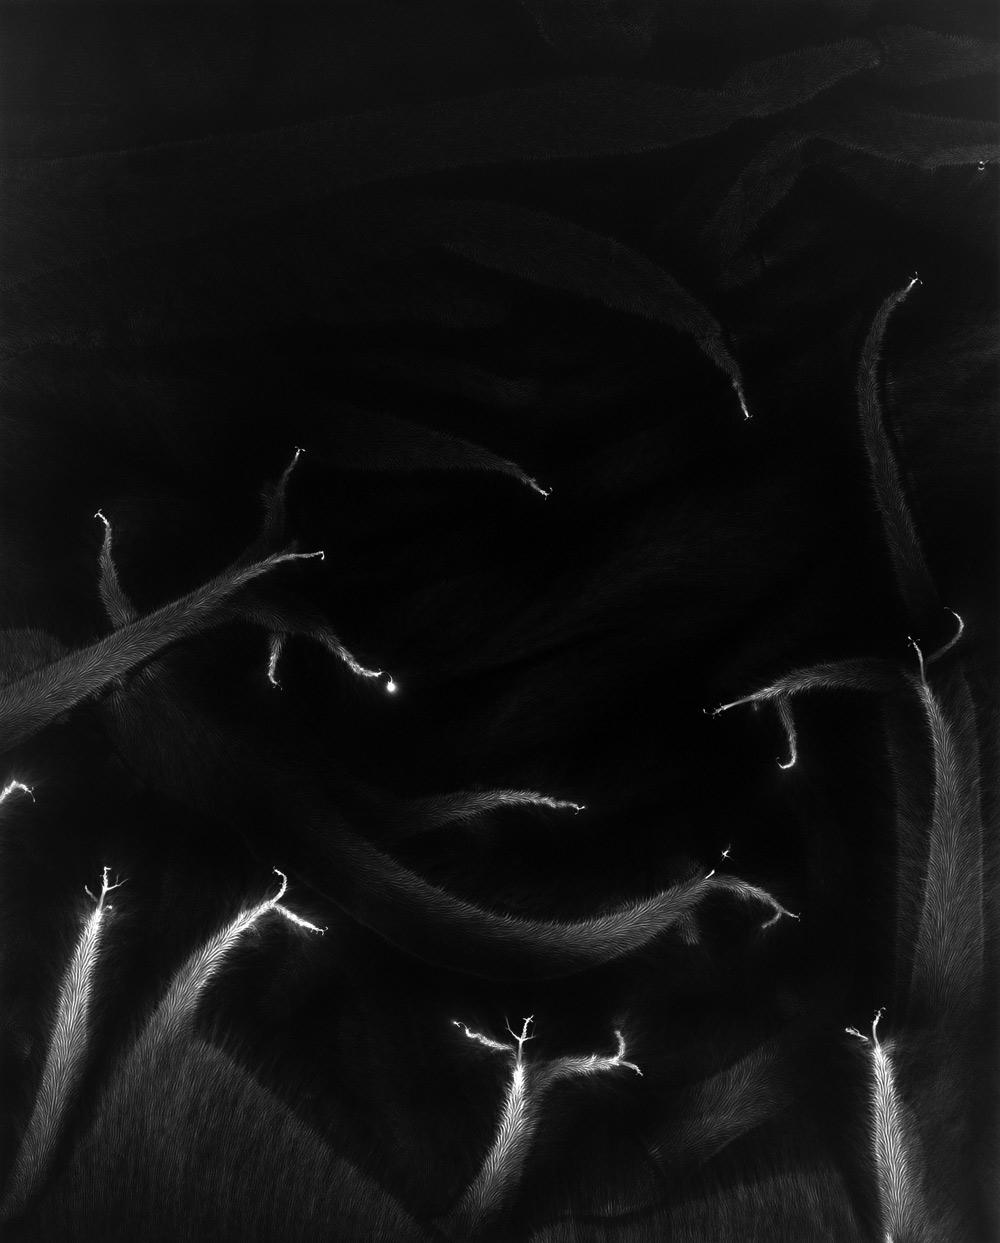 Lightning Fields 190 2009 - Hiroshi Sugimoto Artist - 1.jpg